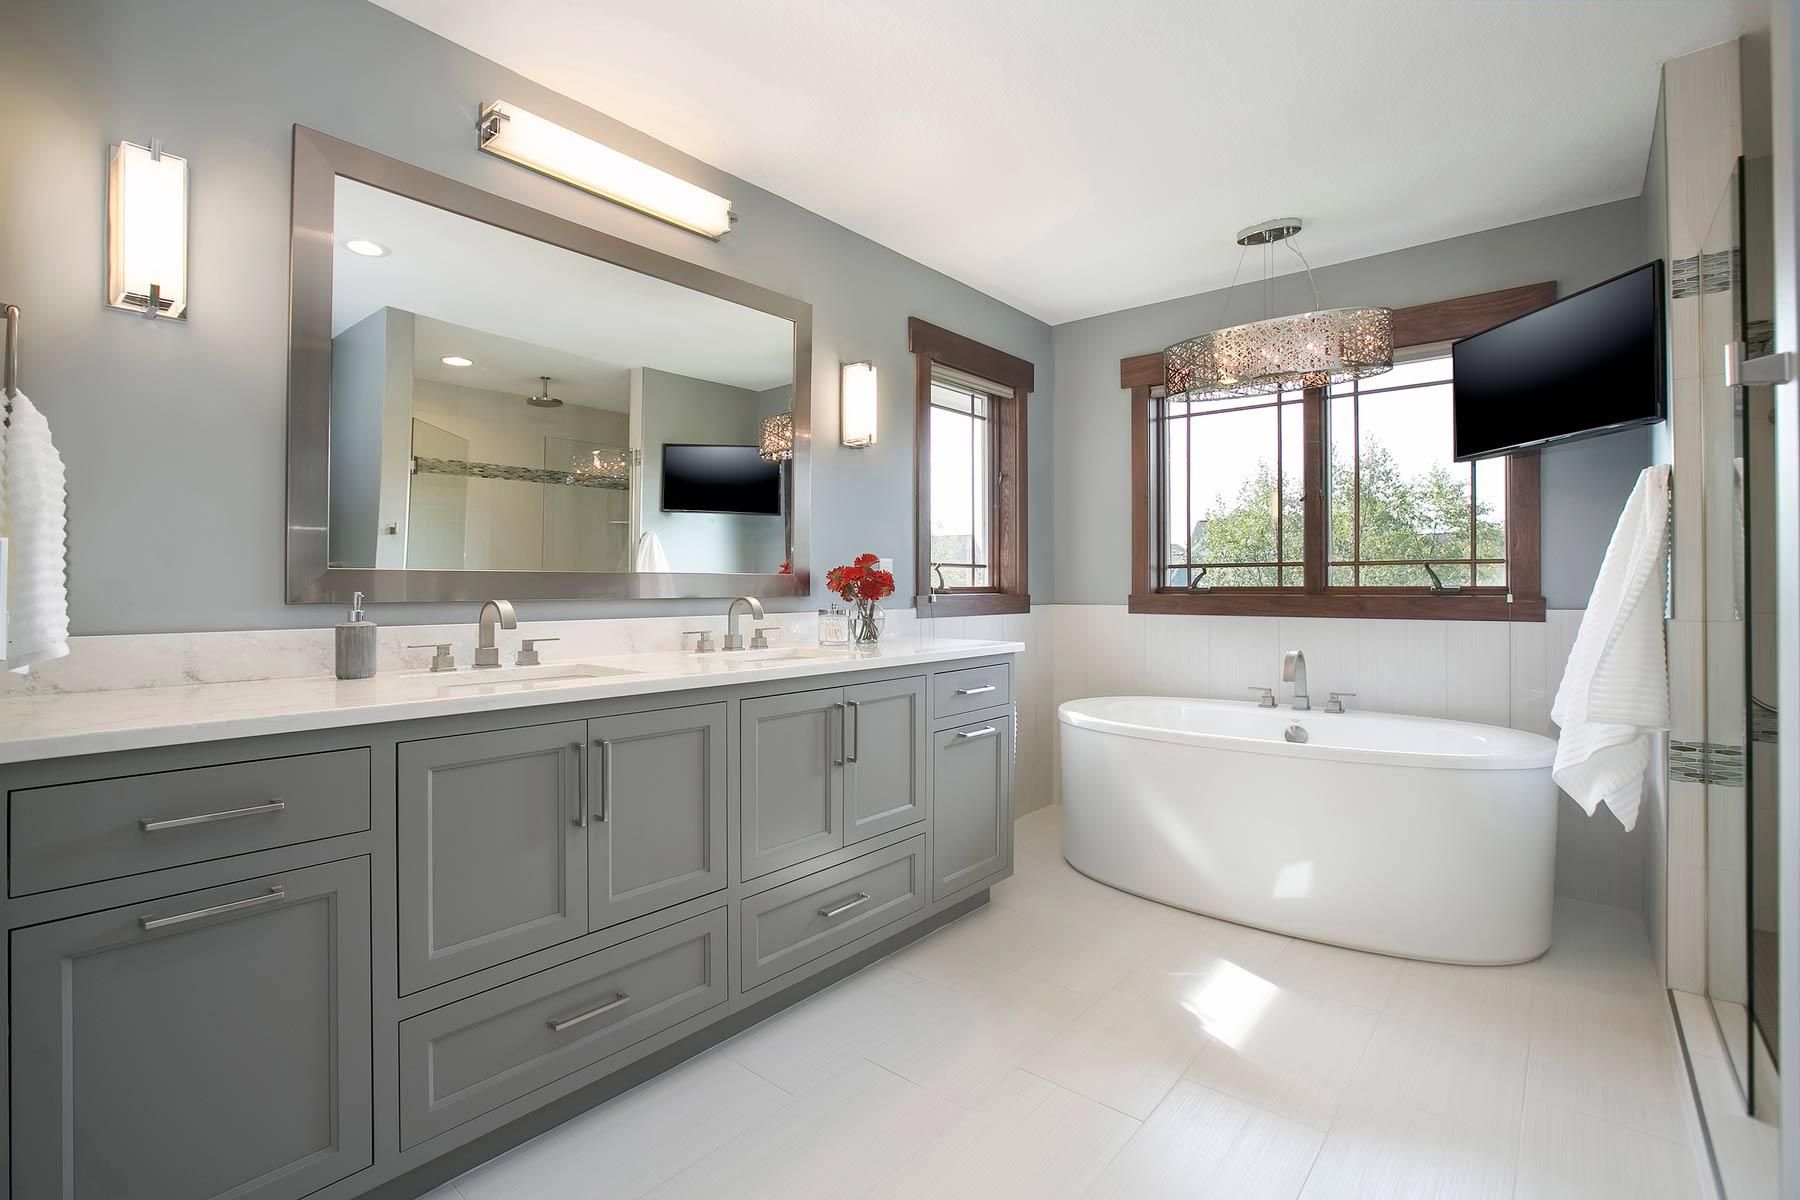 Twin Cities Home Design Remodeling James Barton DesignBuild - Bathroom remodel mn